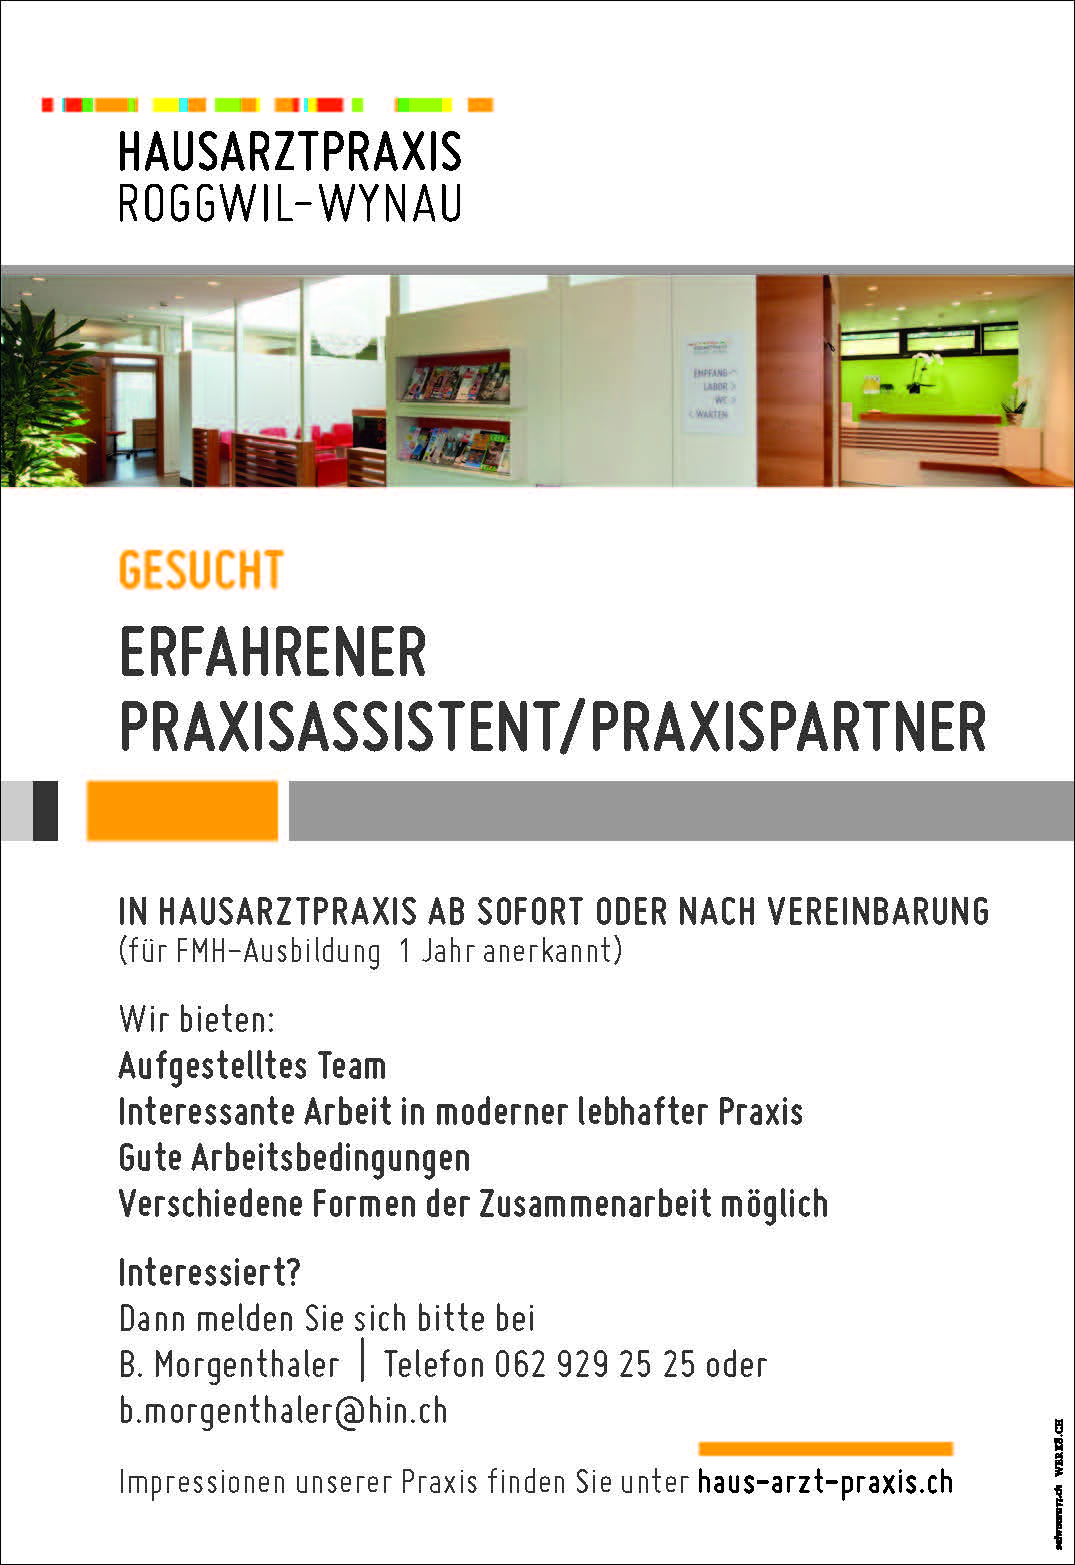 ERFAHRENER PRAXISASSISTENT/PRAXISPARTNER